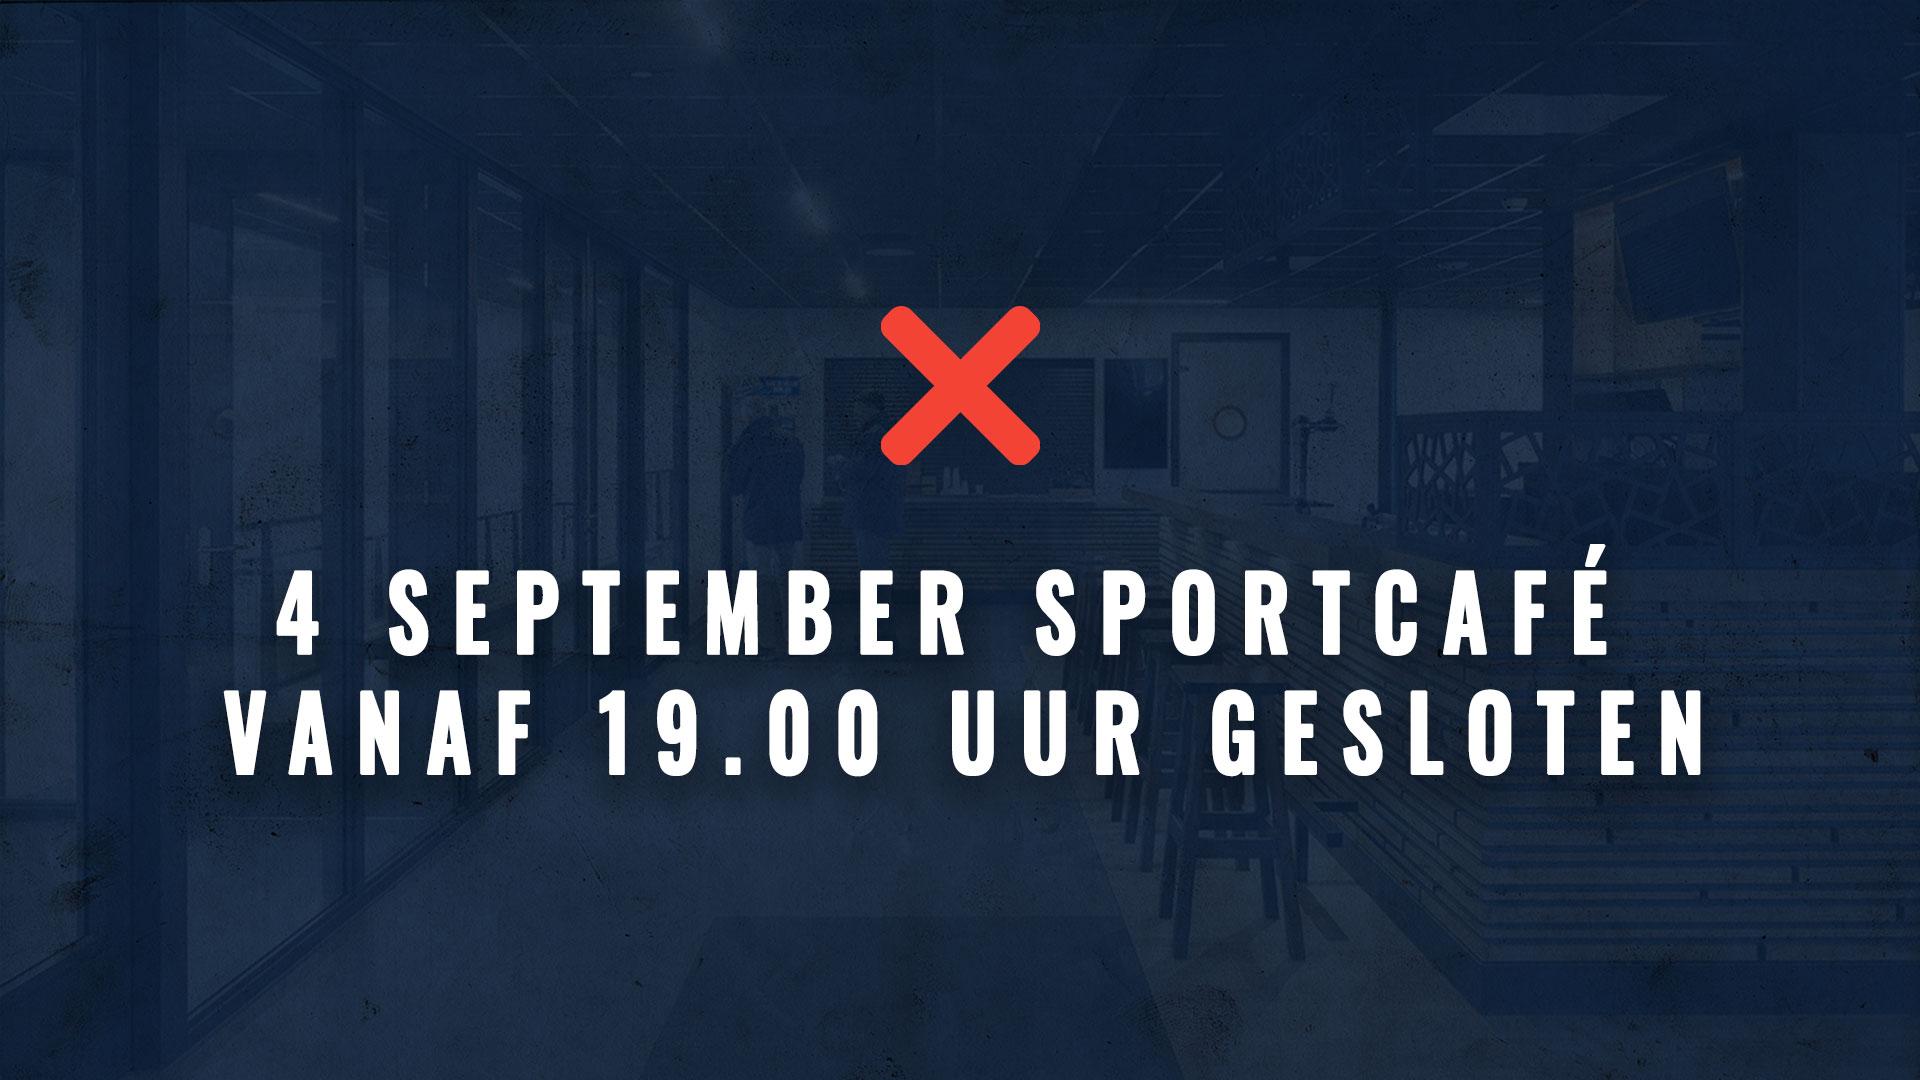 4 september sportcafé vanaf 19.00 uur gesloten